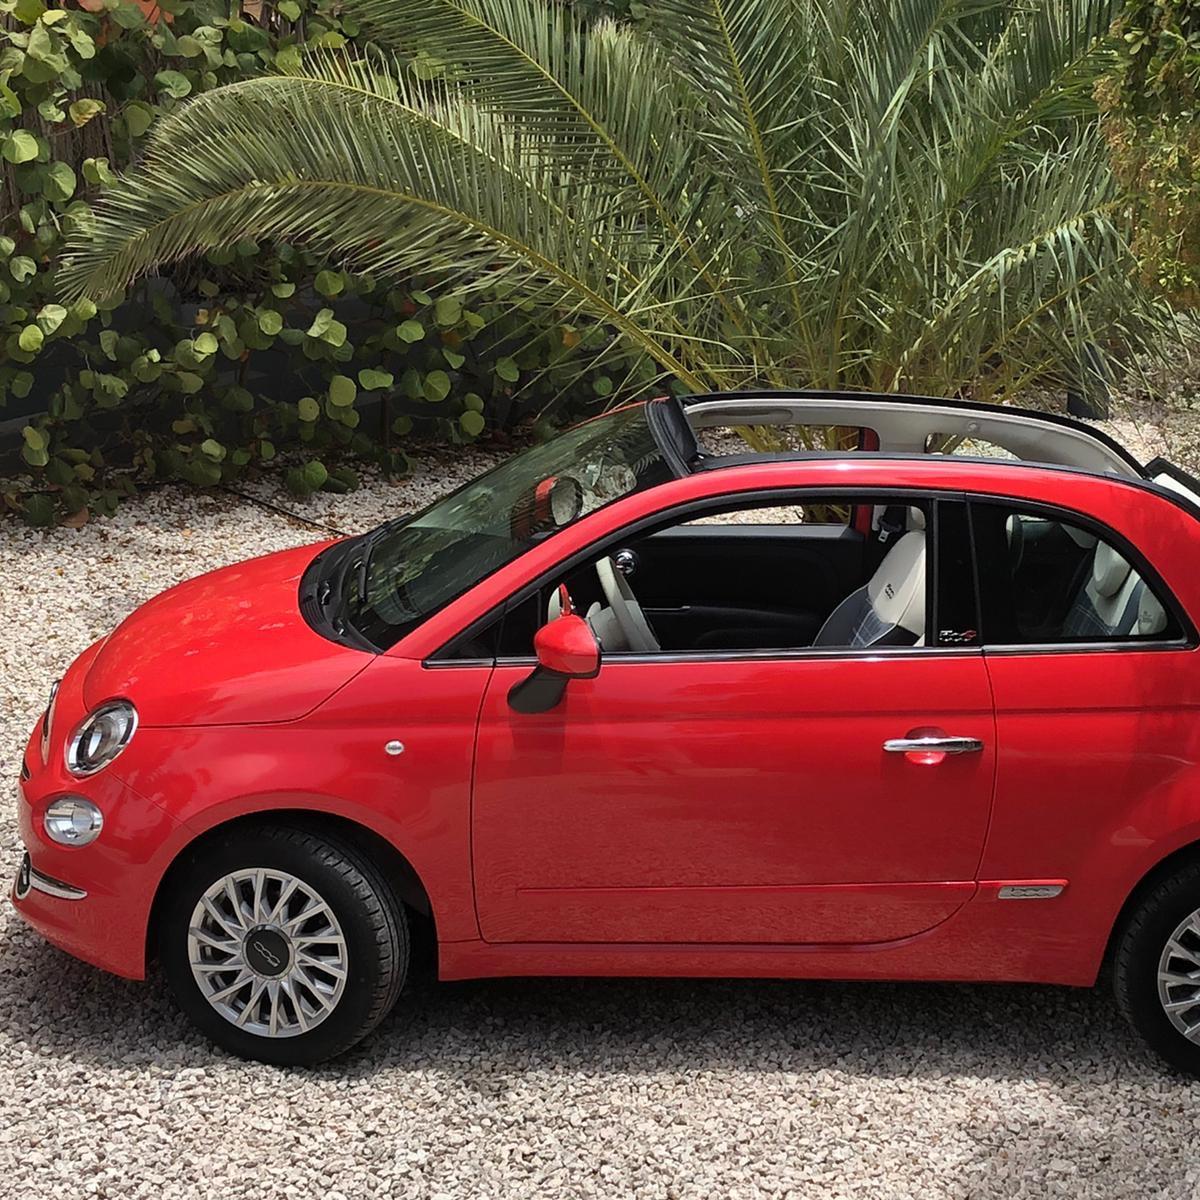 Fiat 500 cabrio coral red - USD 55 p.d.*